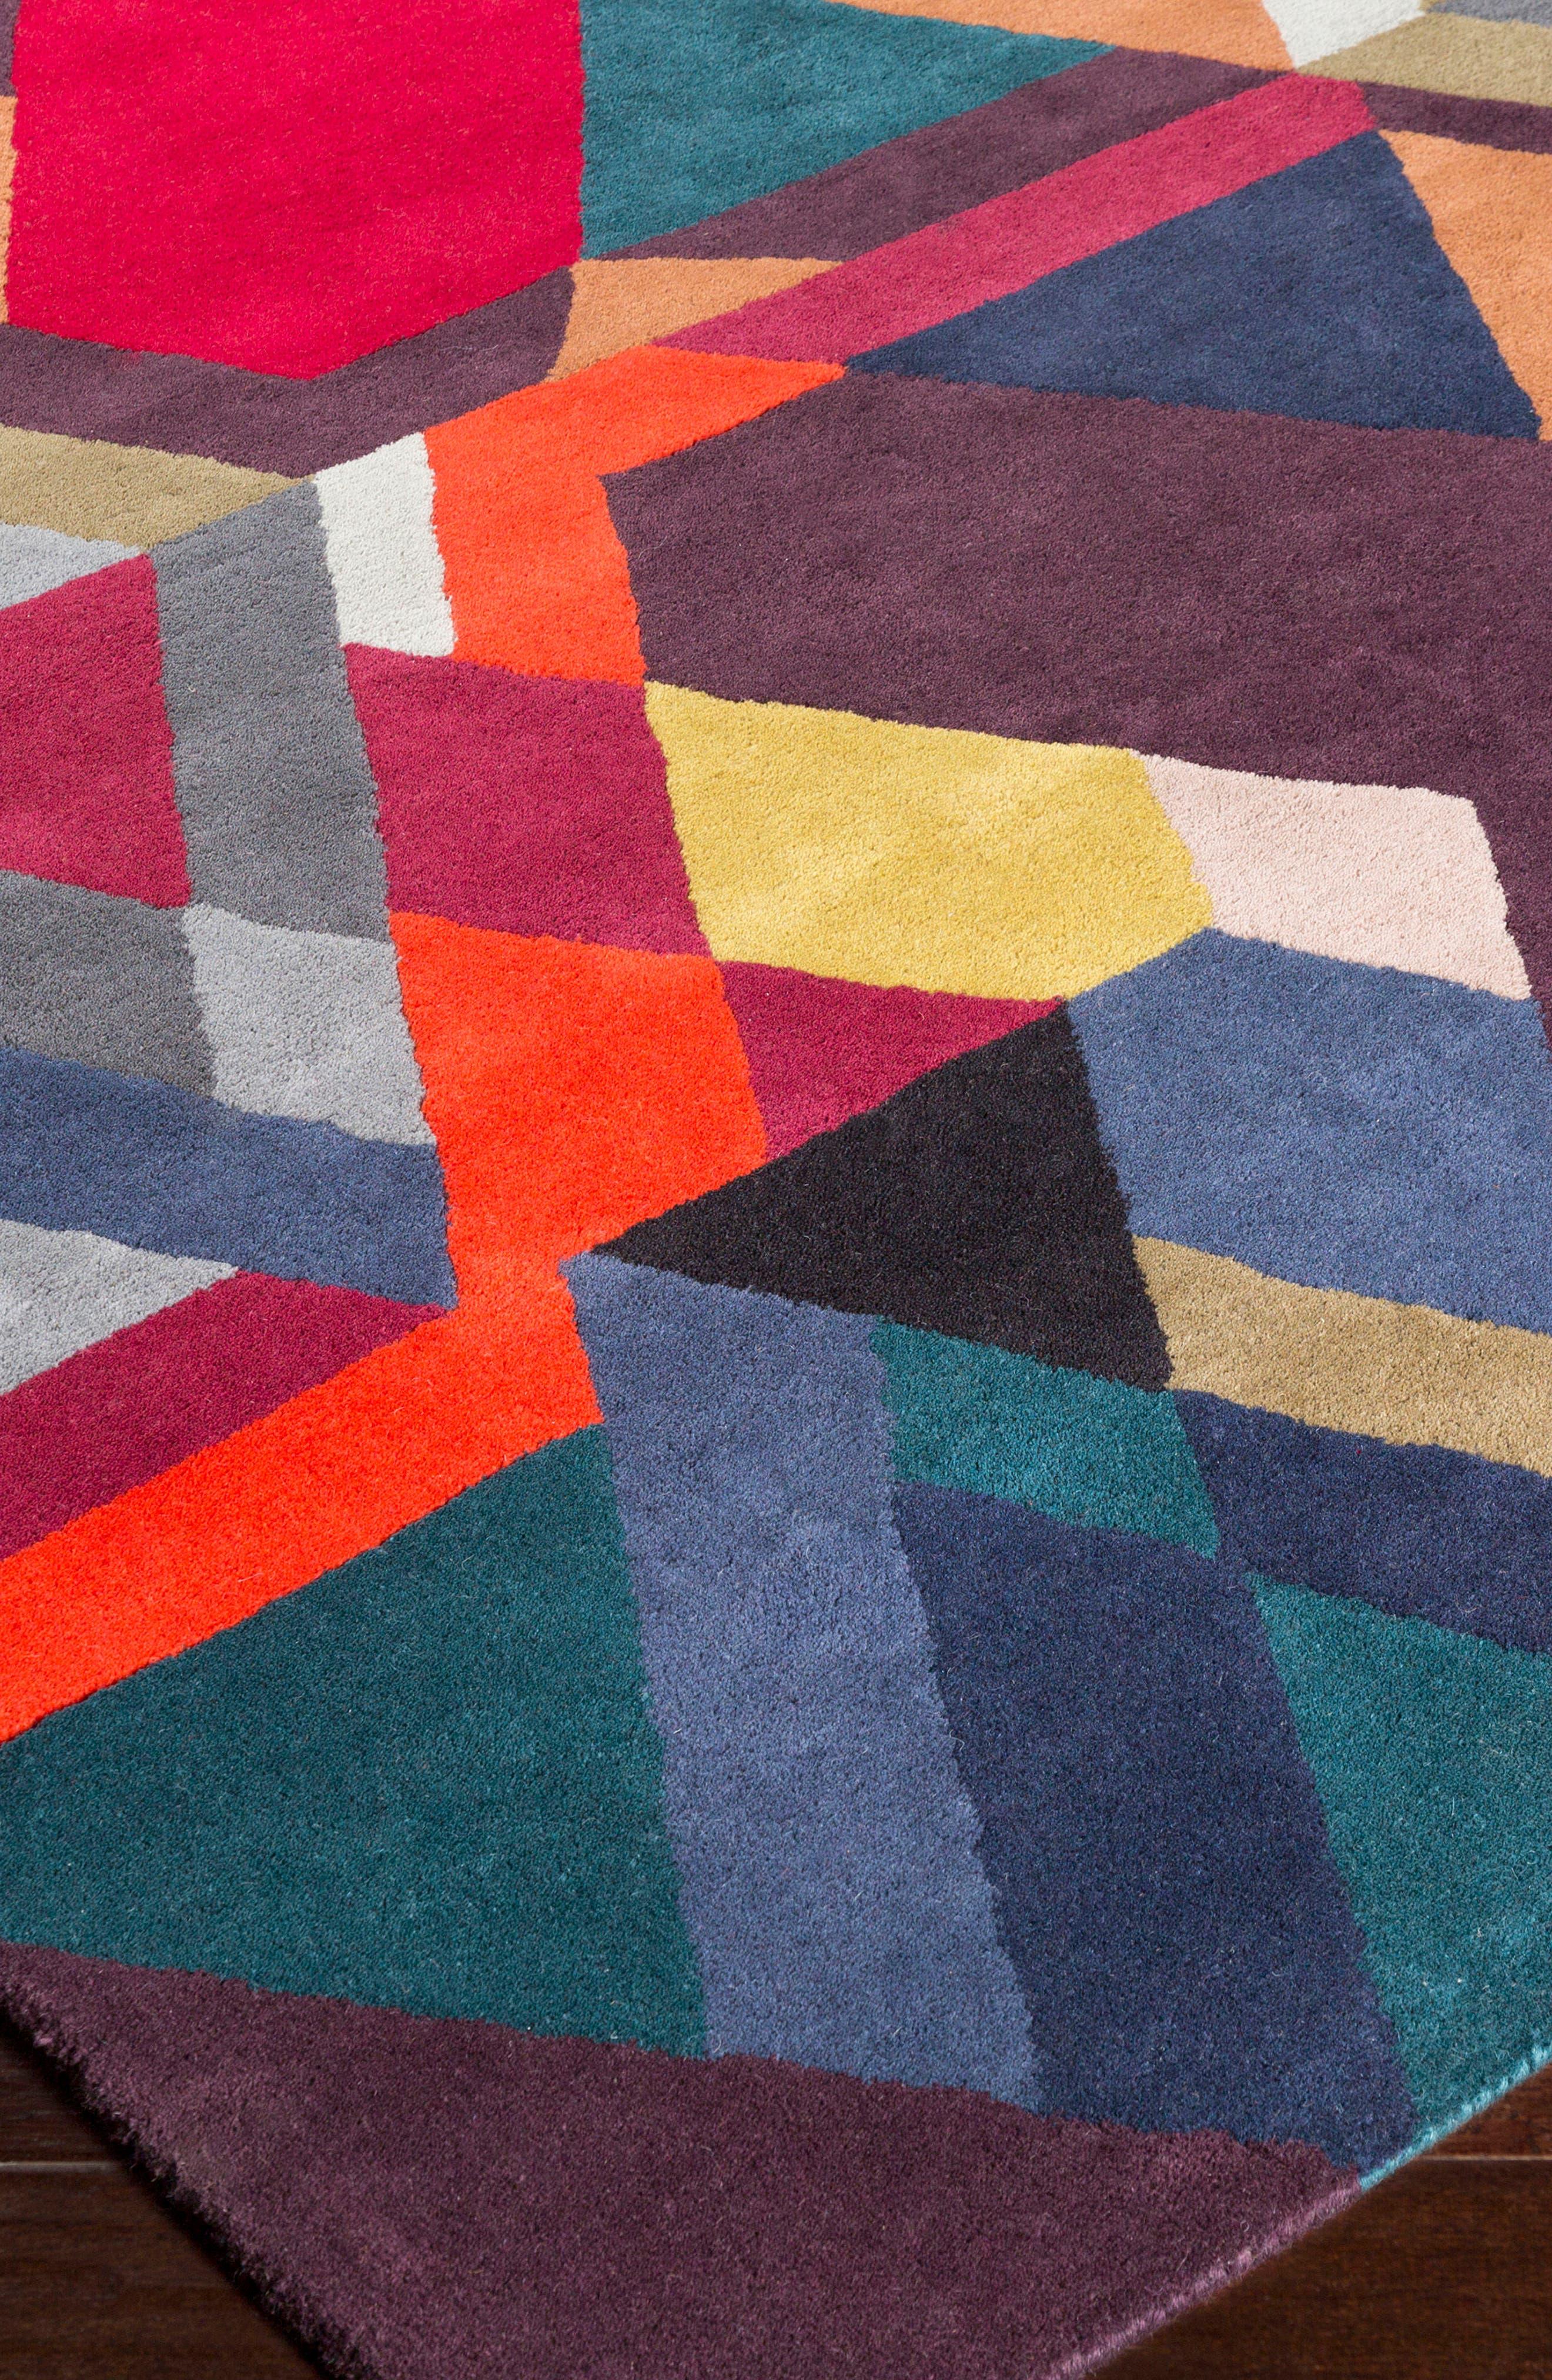 x Surya Iconic Wool Area Rug,                             Alternate thumbnail 2, color,                             500